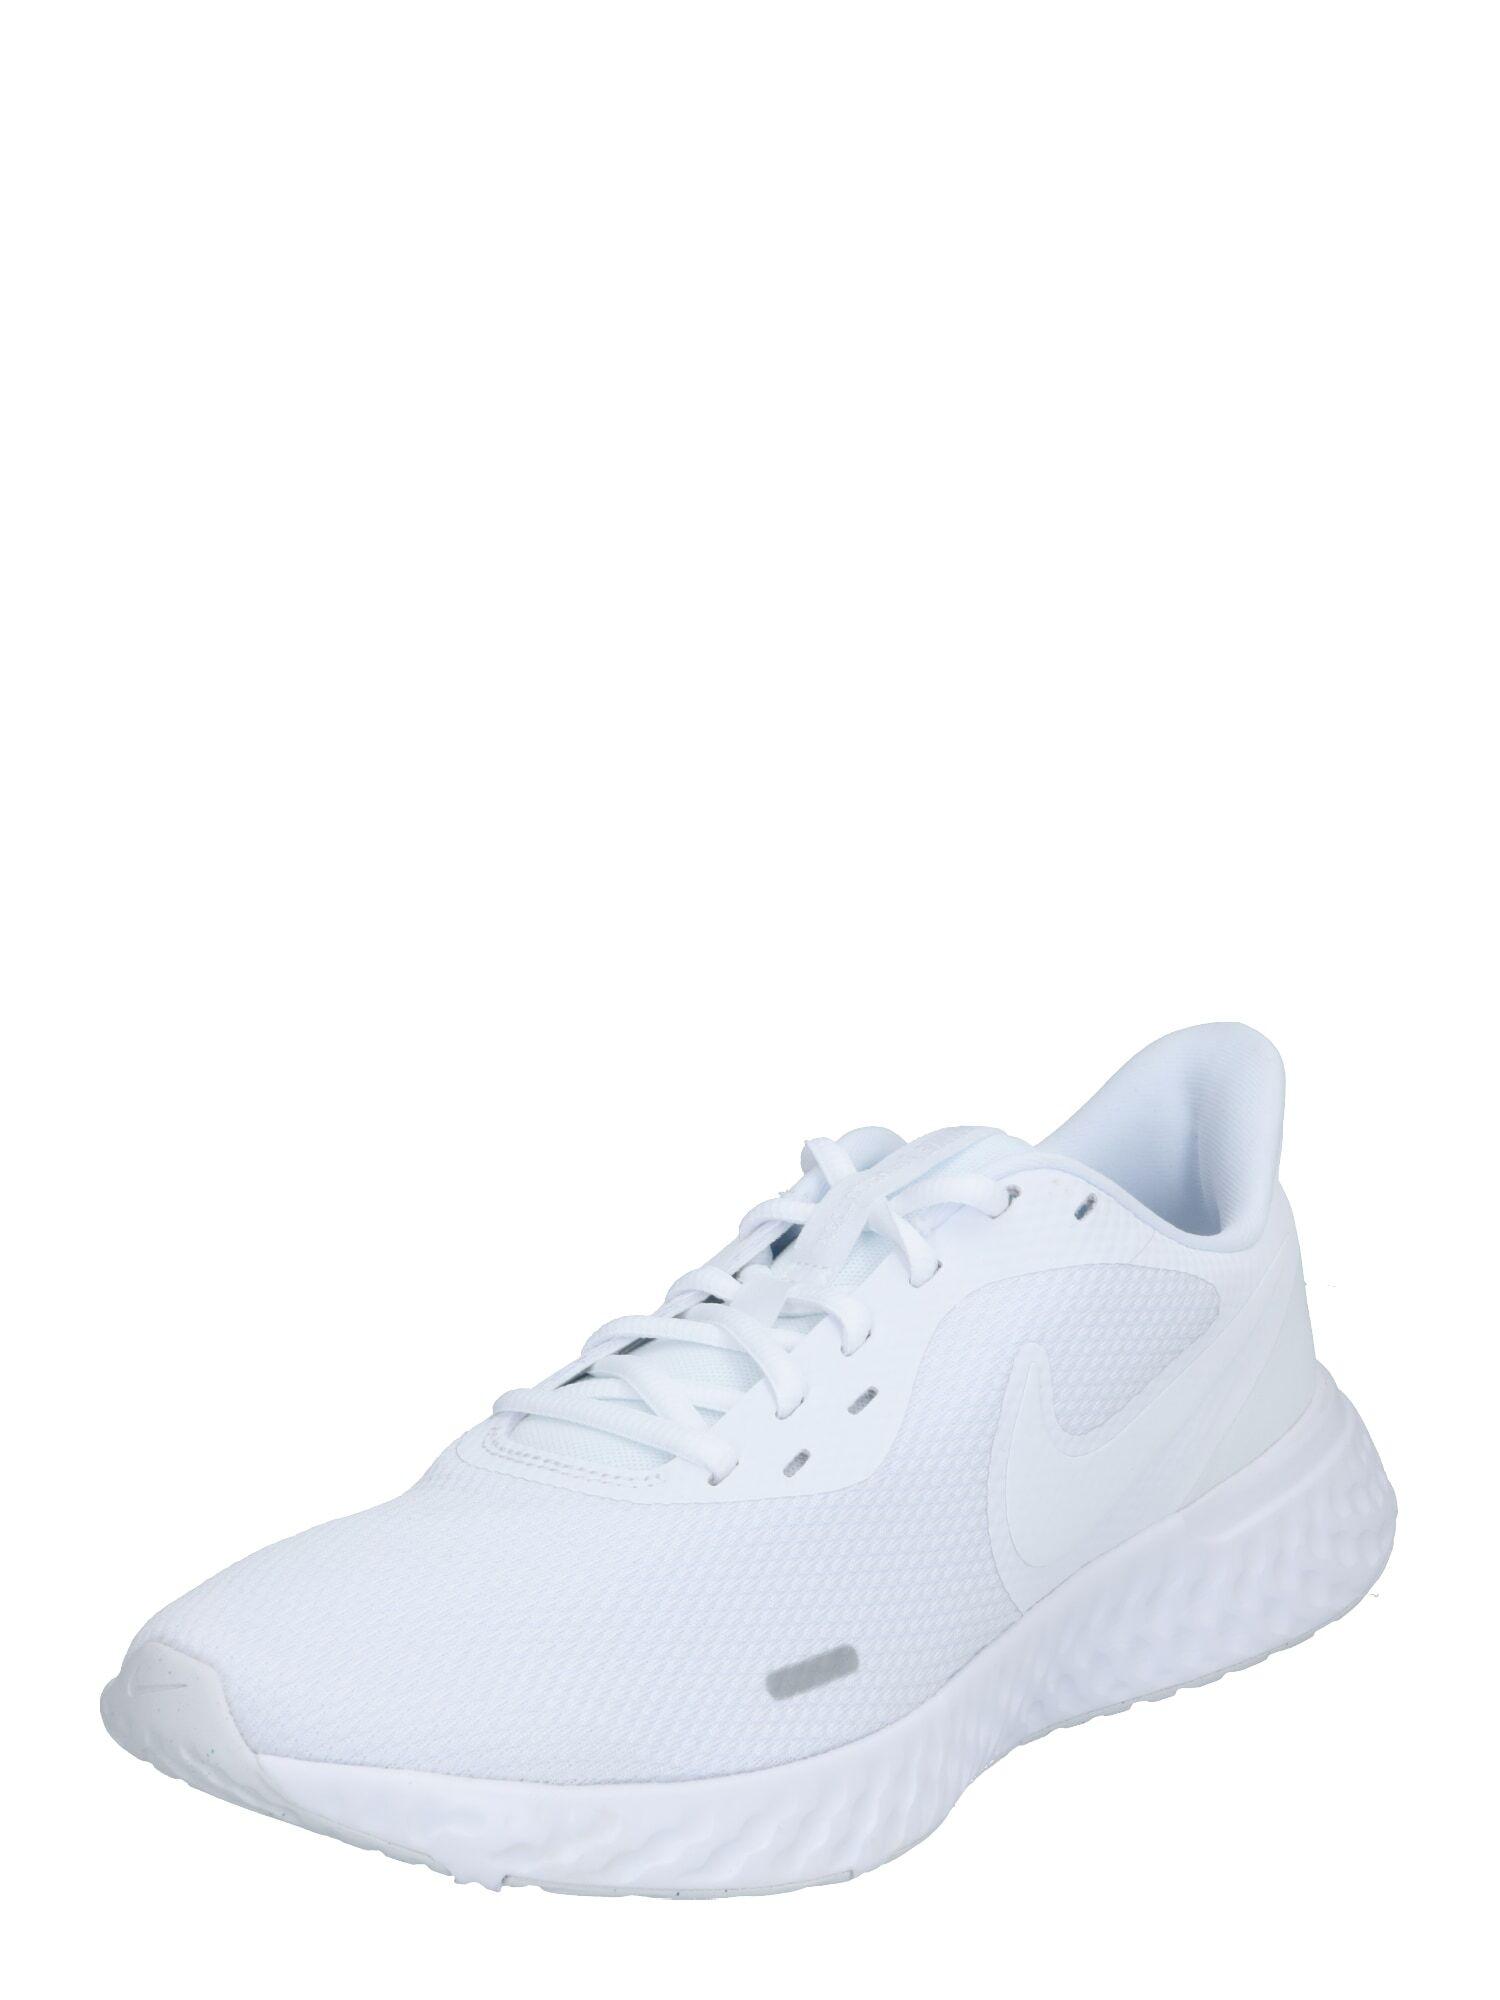 NIKE Chaussure de course 'Revolution 5'  - Blanc - Taille: 8 - male